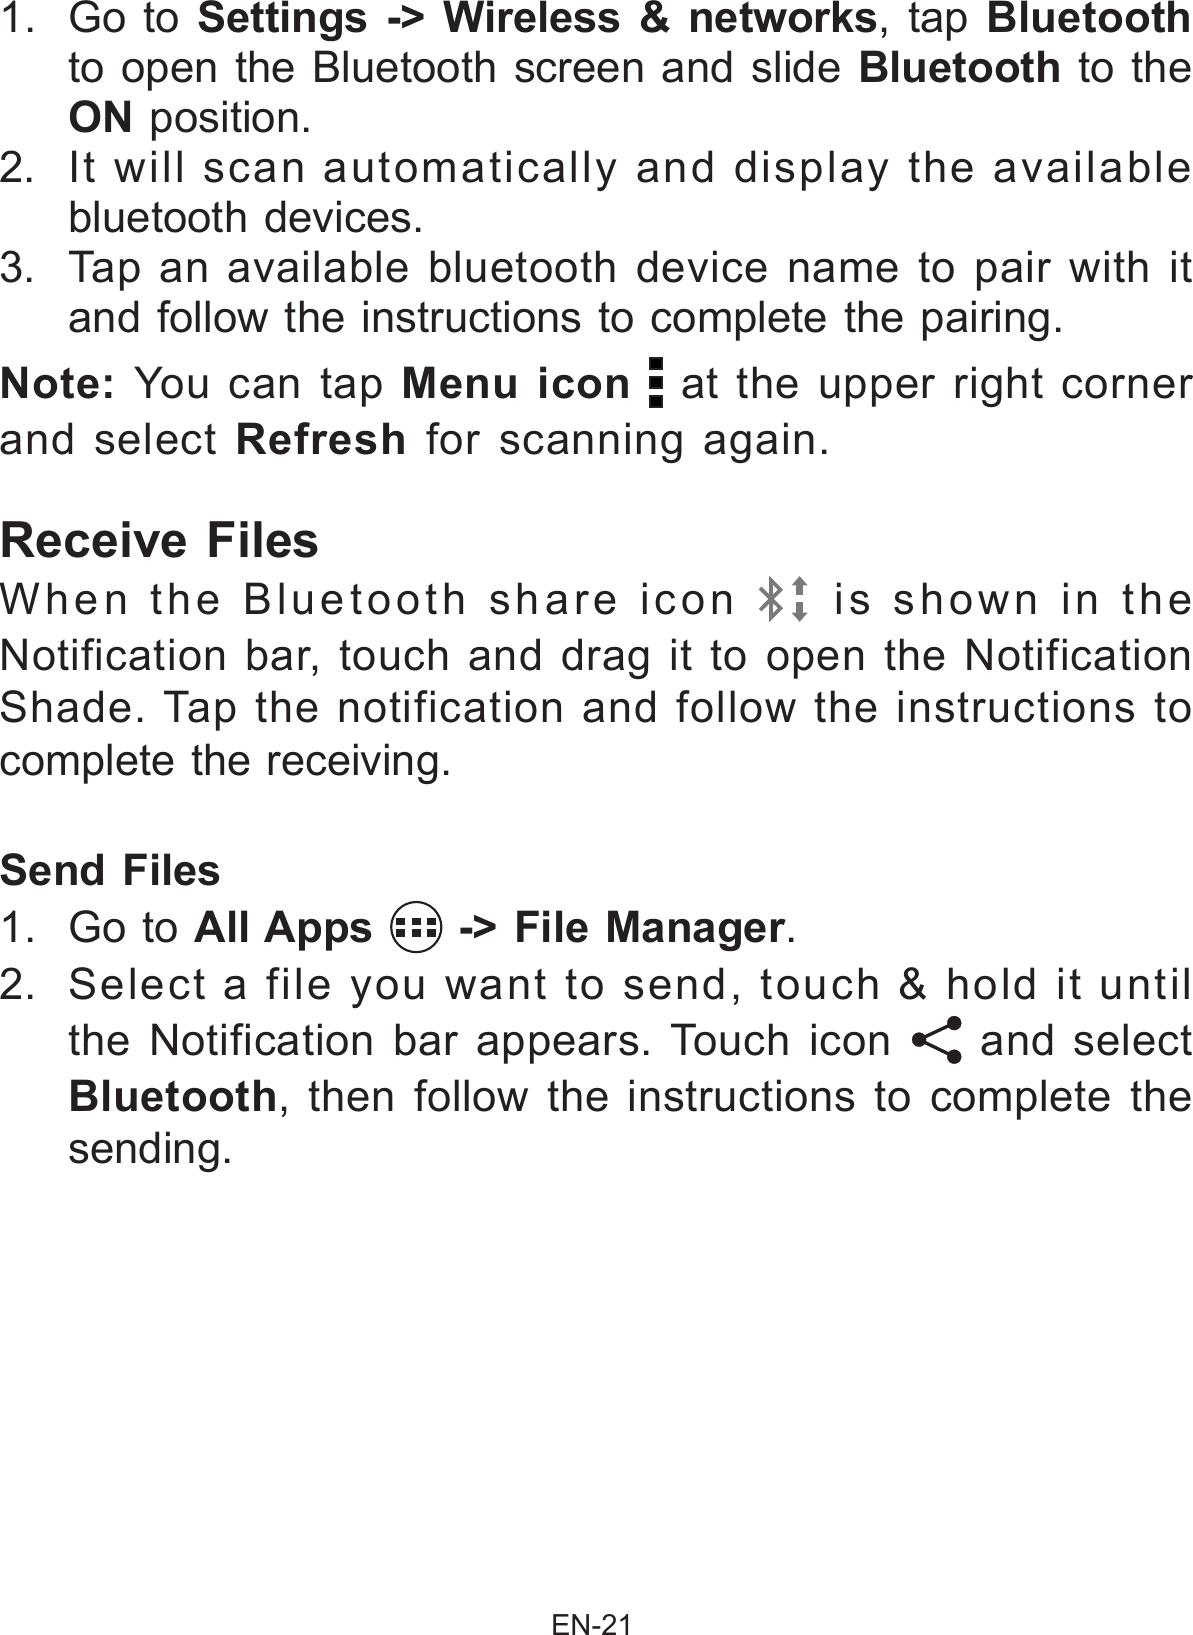 rca manual for tv ebook